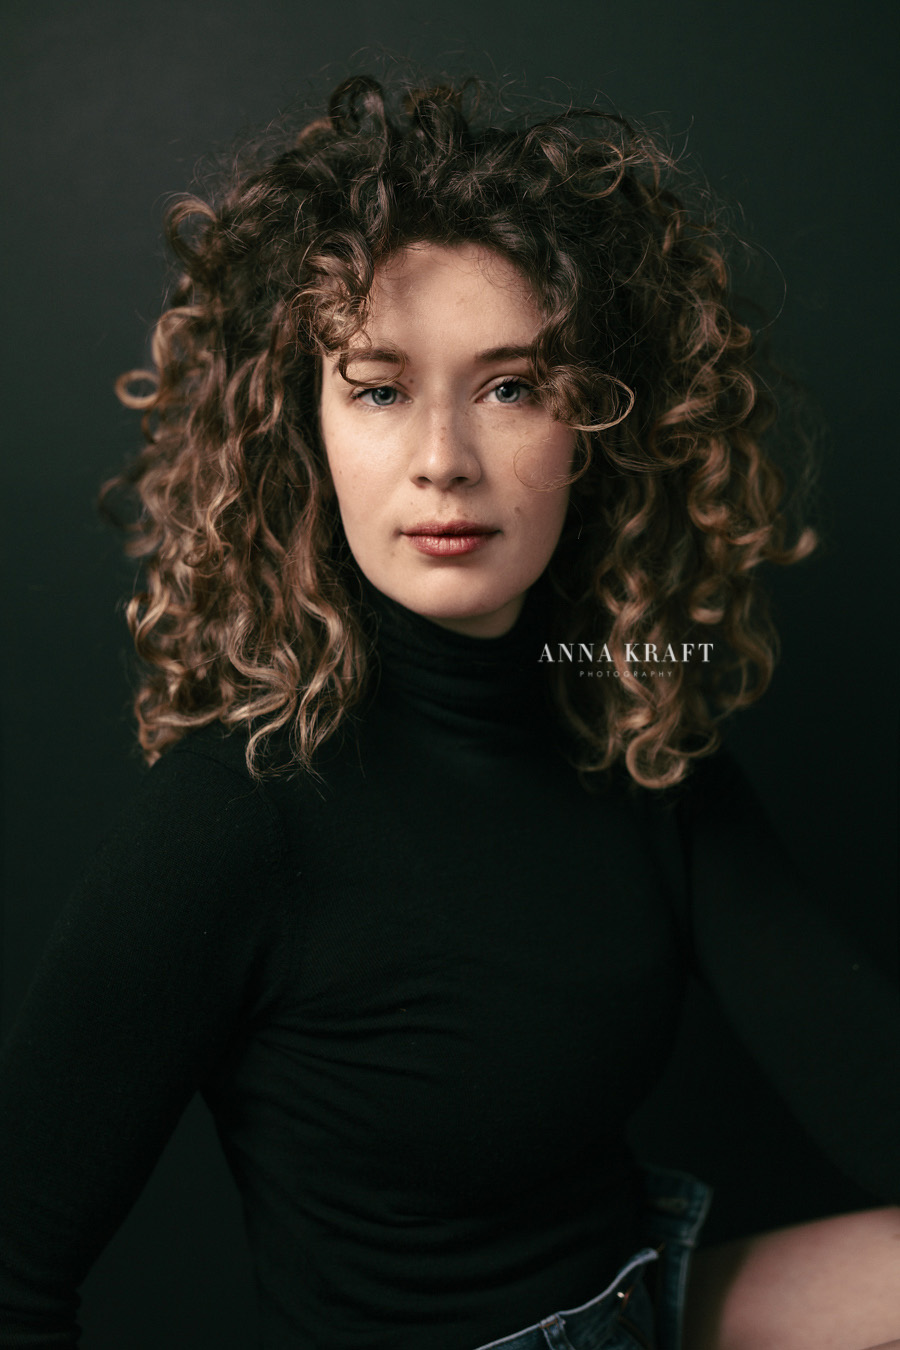 anna_kraft_photography_georgetown_square_studio_family_portrait-4.jpg